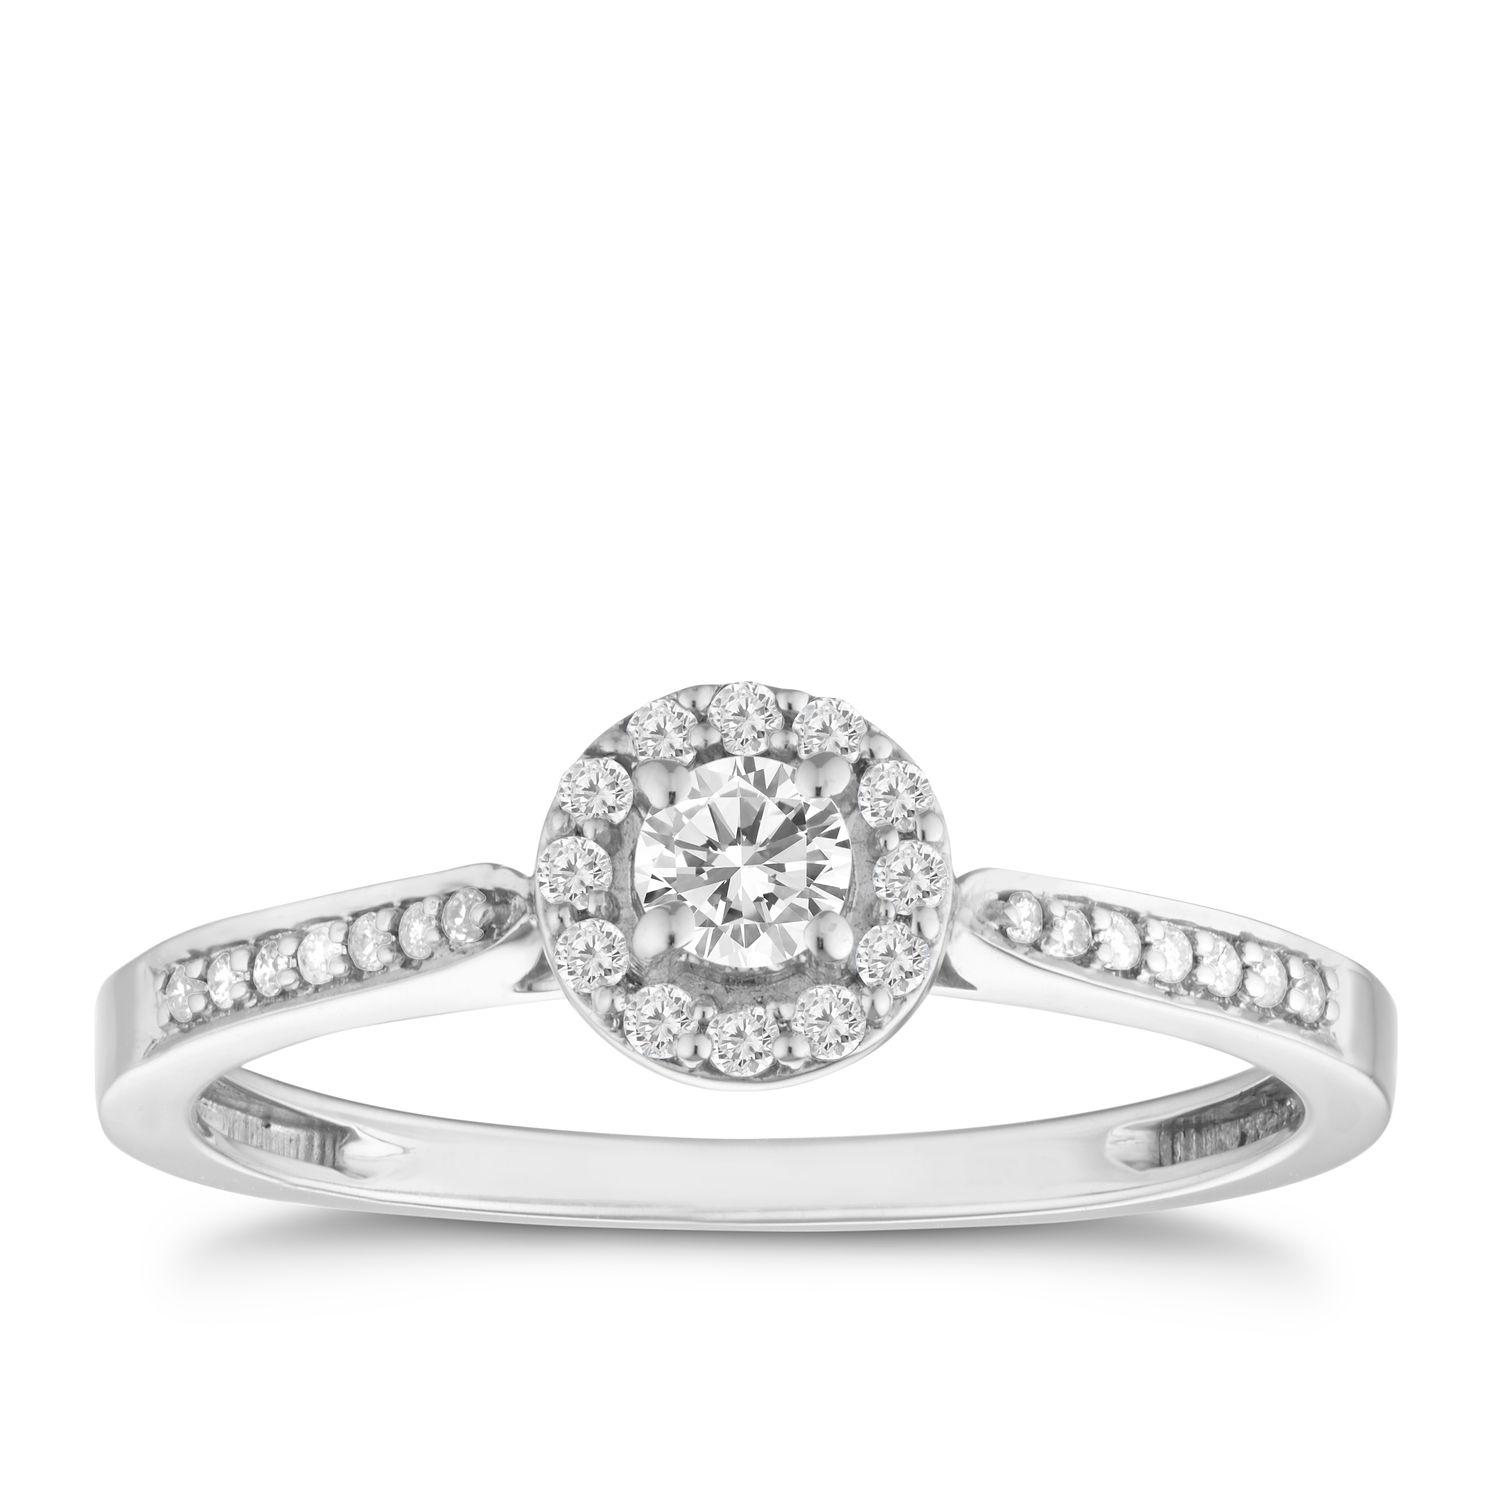 Diamond Engagement Rings - Gold & Platinum - Ernest Jones ...